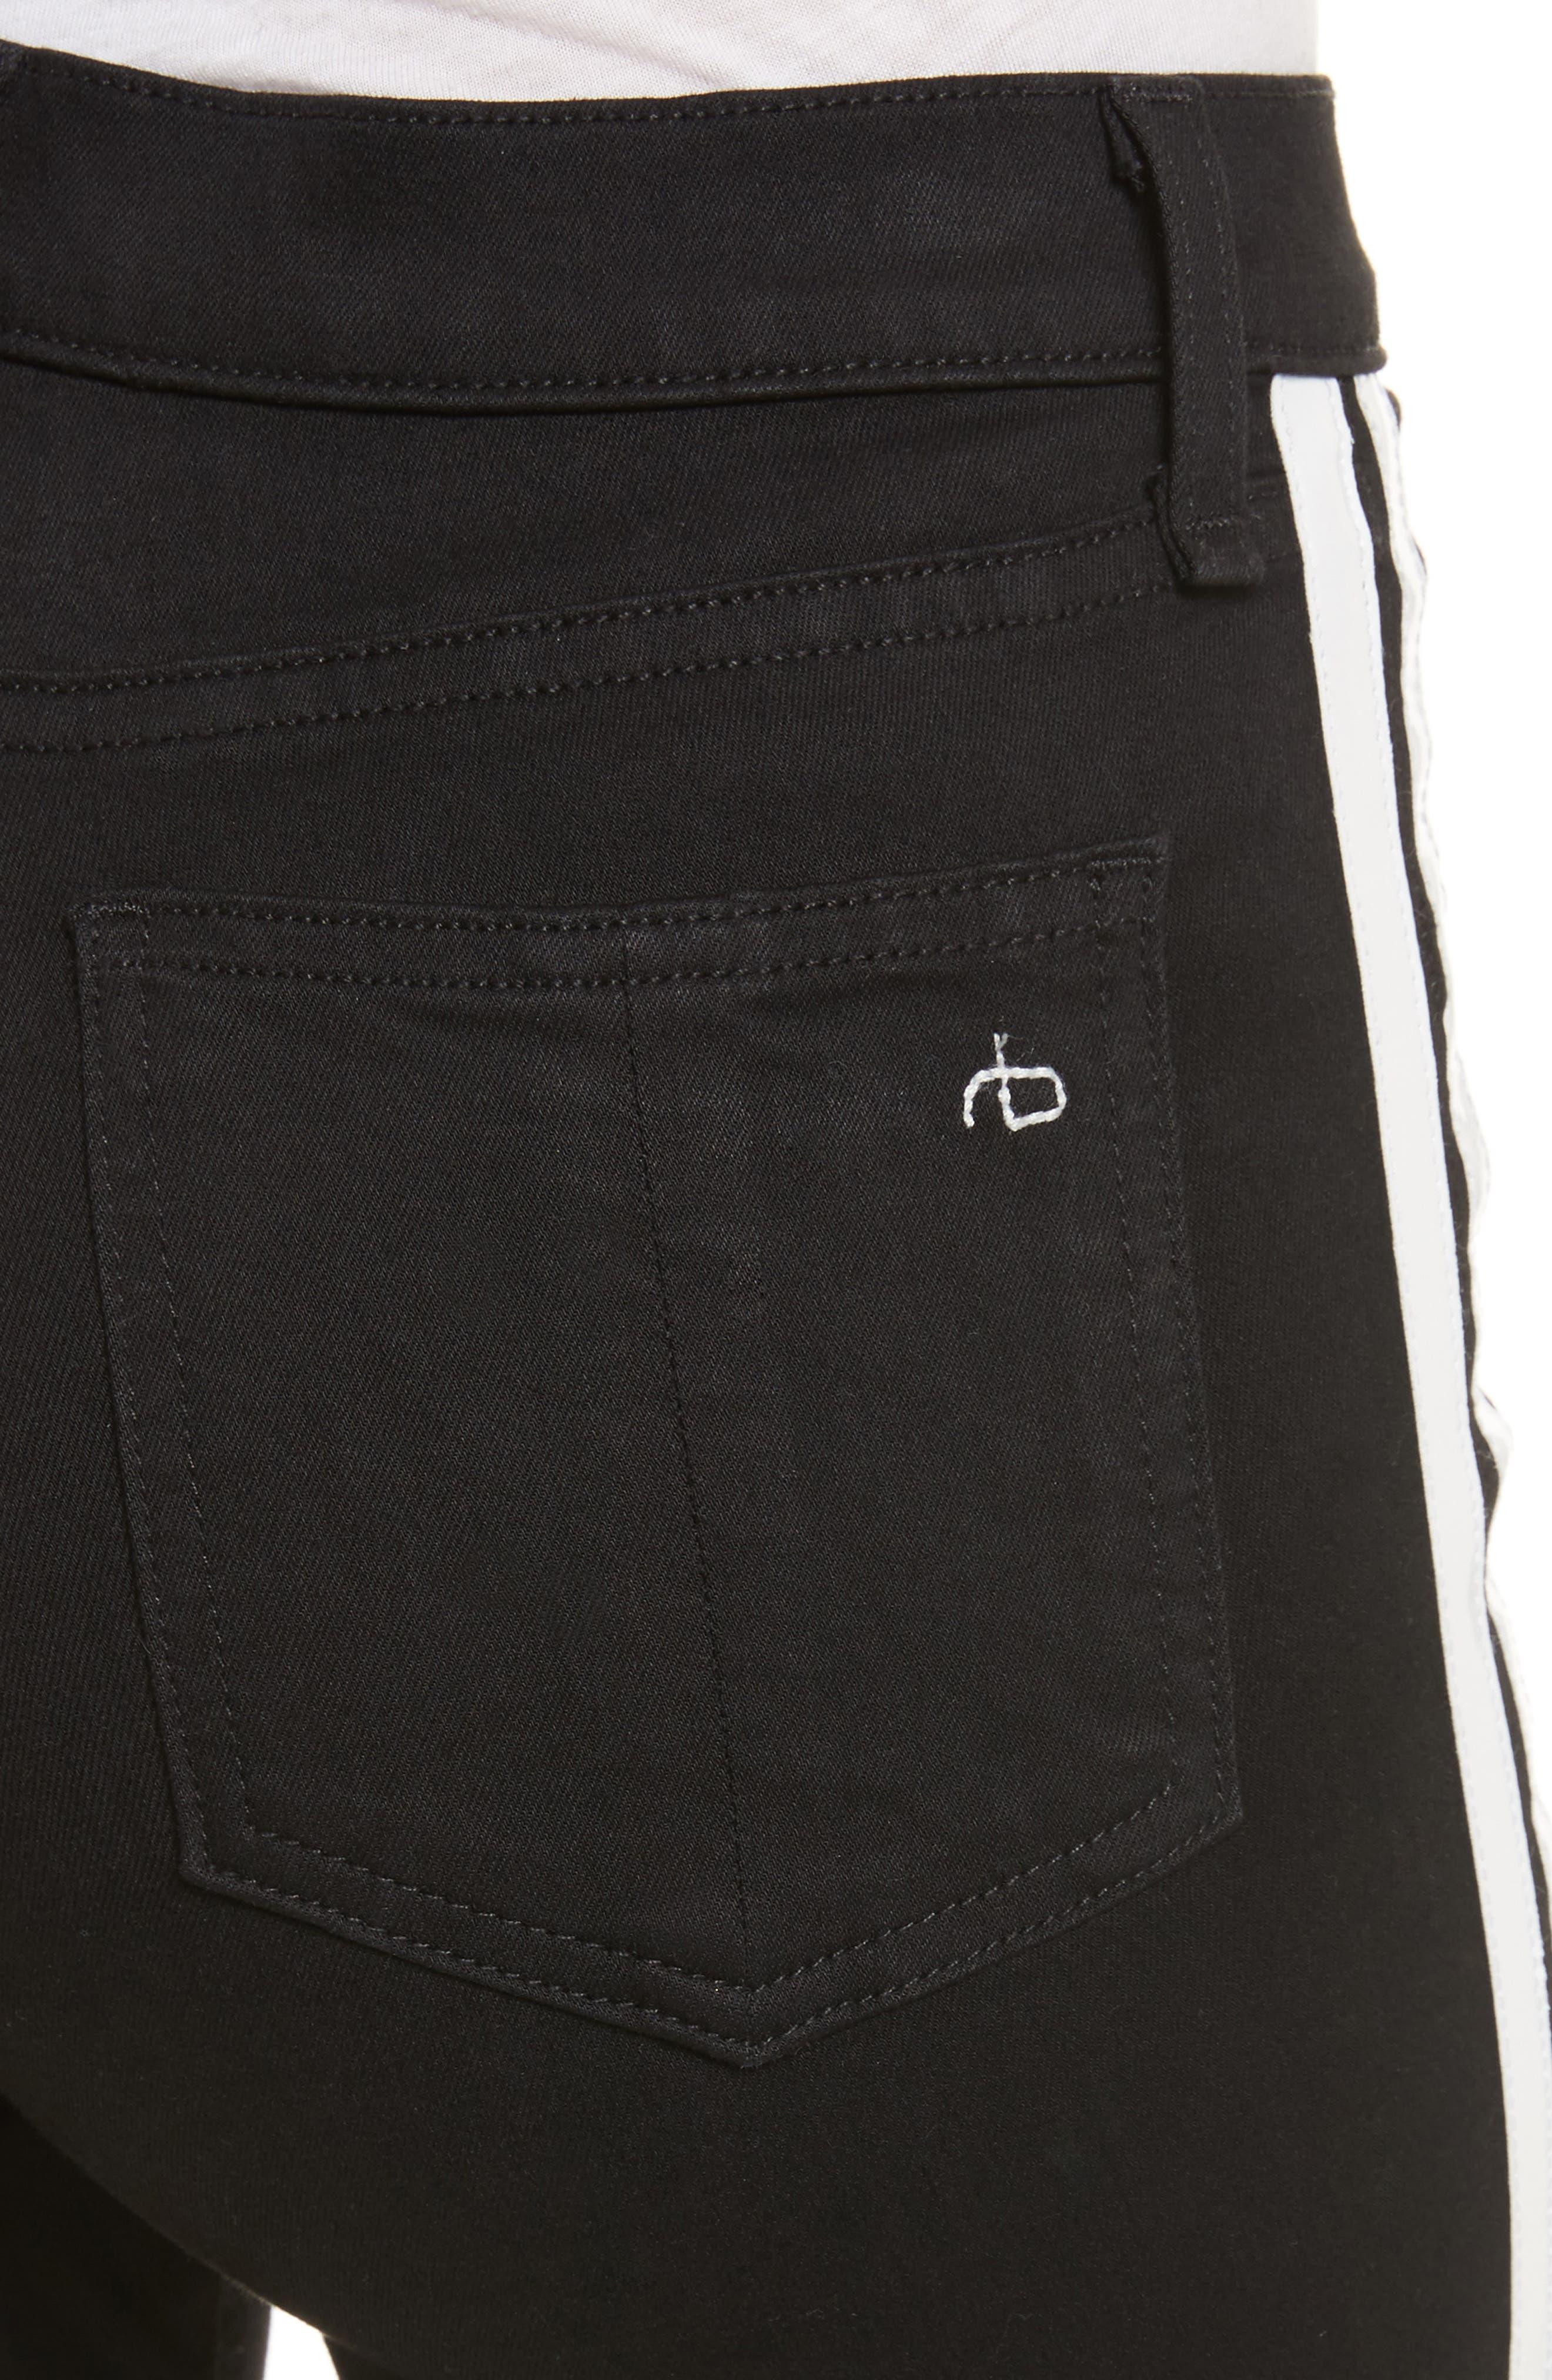 Mito High Waist Skinny Jeans,                             Alternate thumbnail 4, color,                             Black